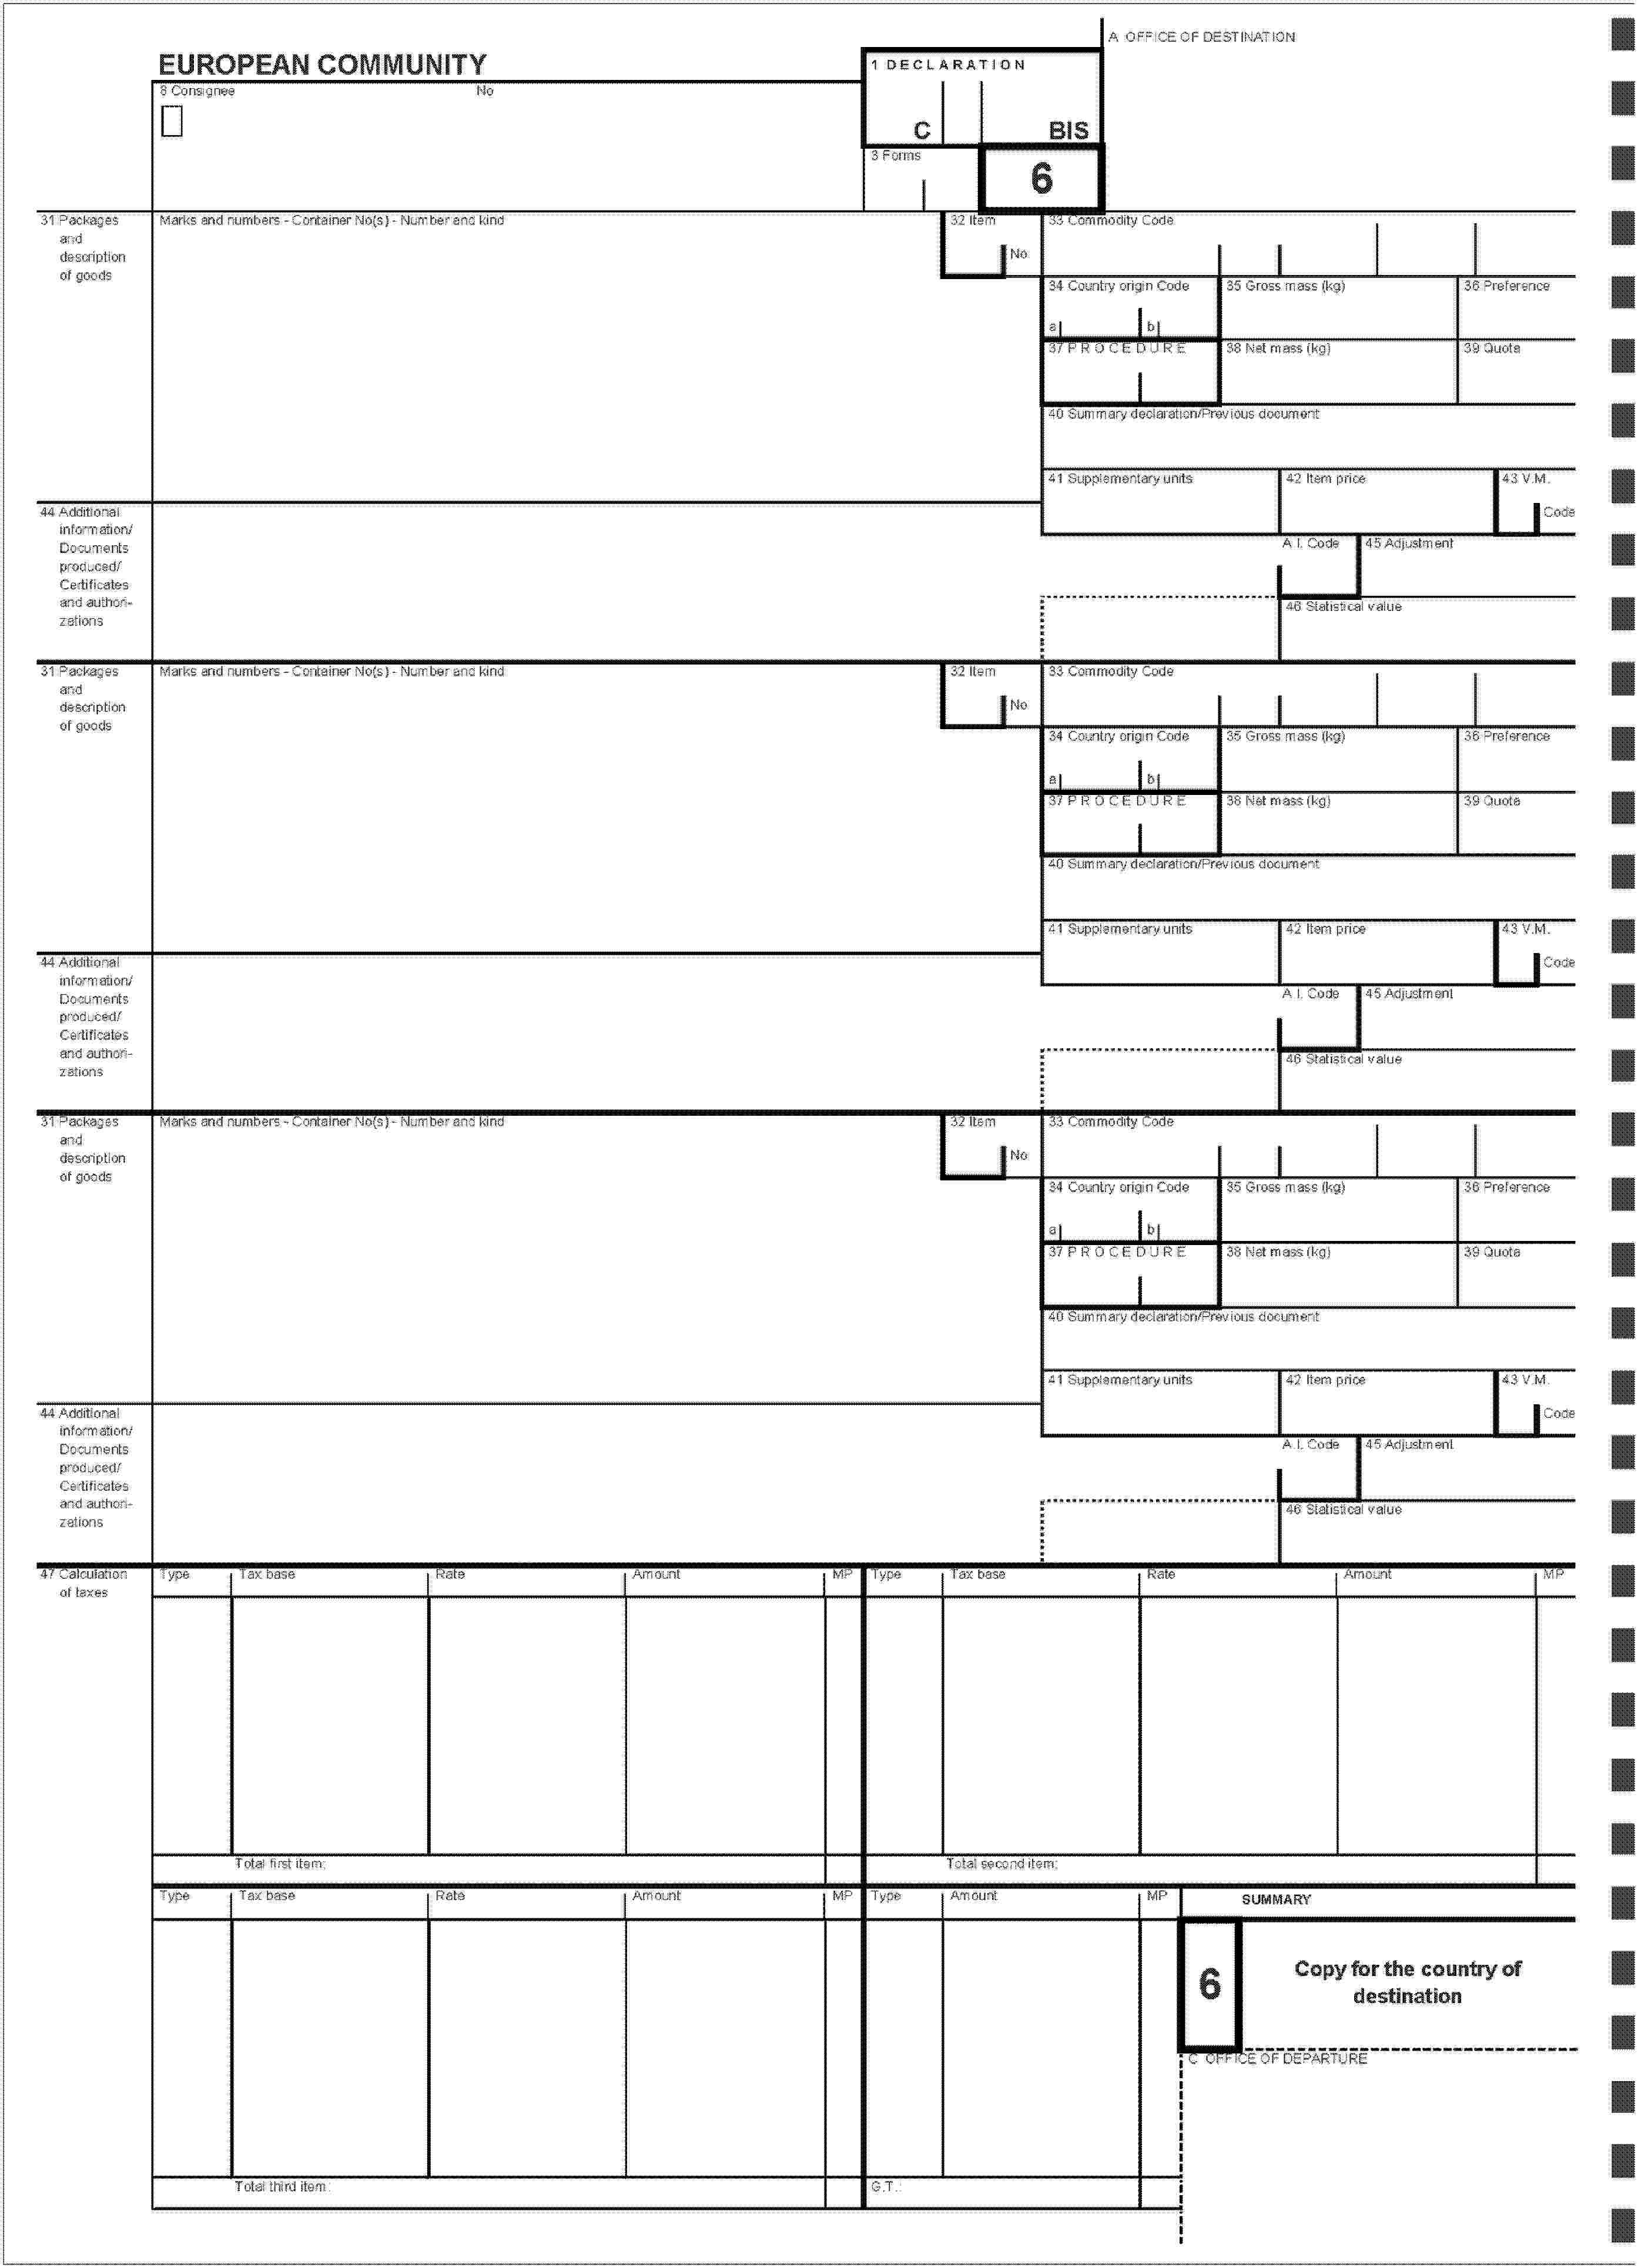 Eur Lex 01993r2454 20090701 En Figure 9 The Black Box Diagram For Roaster